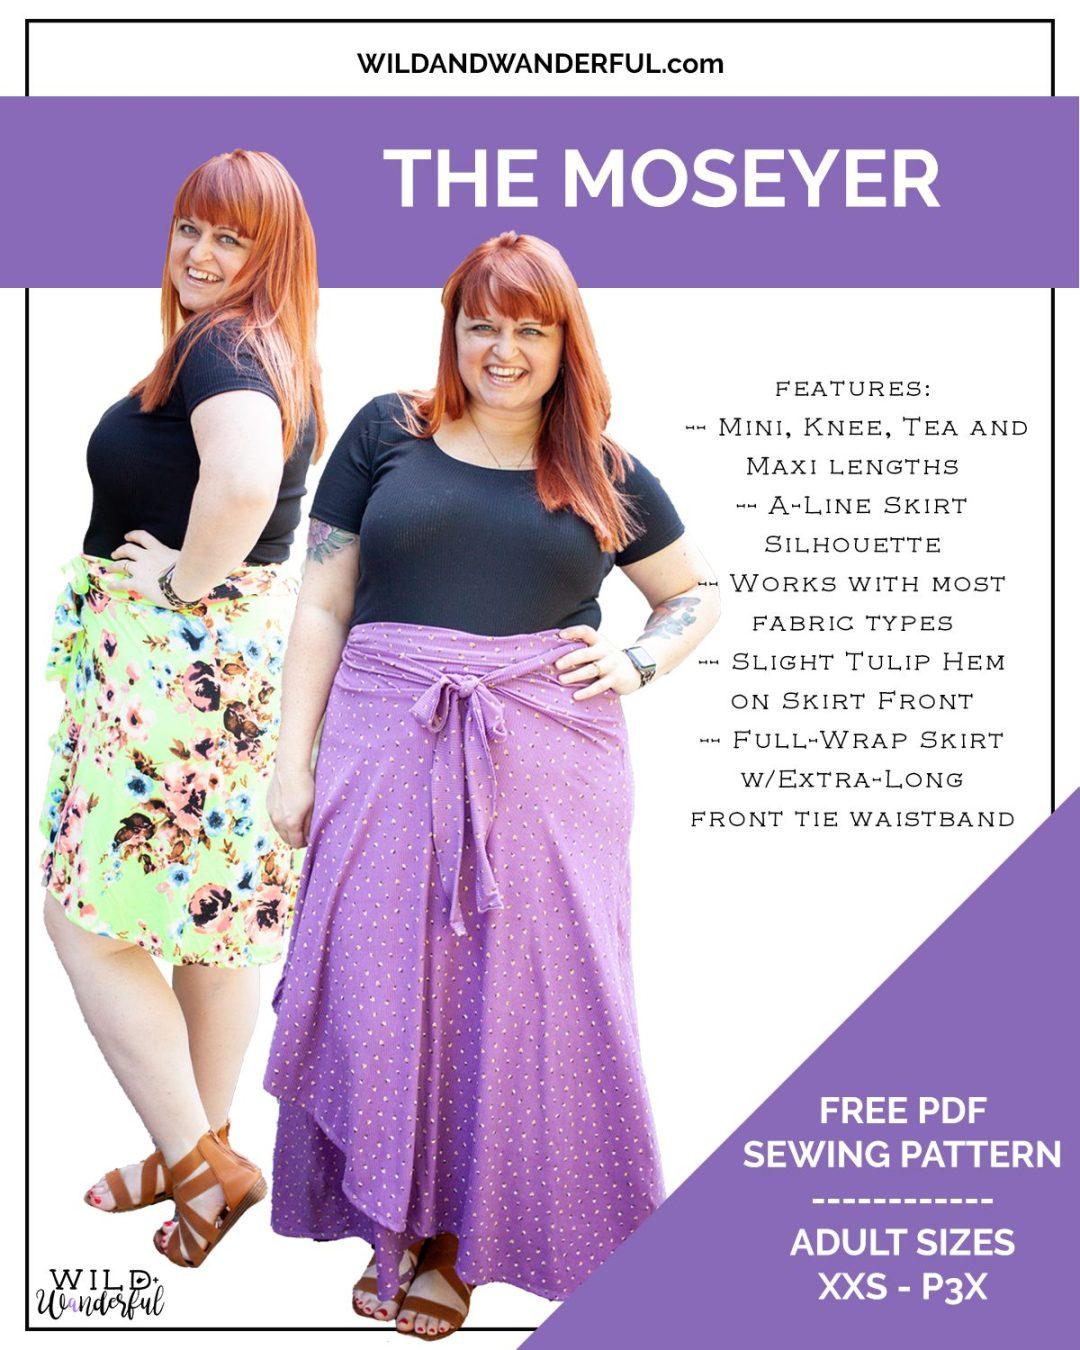 The Moseyer Skirt | A New FREEBIE Wrap Skirt Pattern, by Wild + Wanderful!